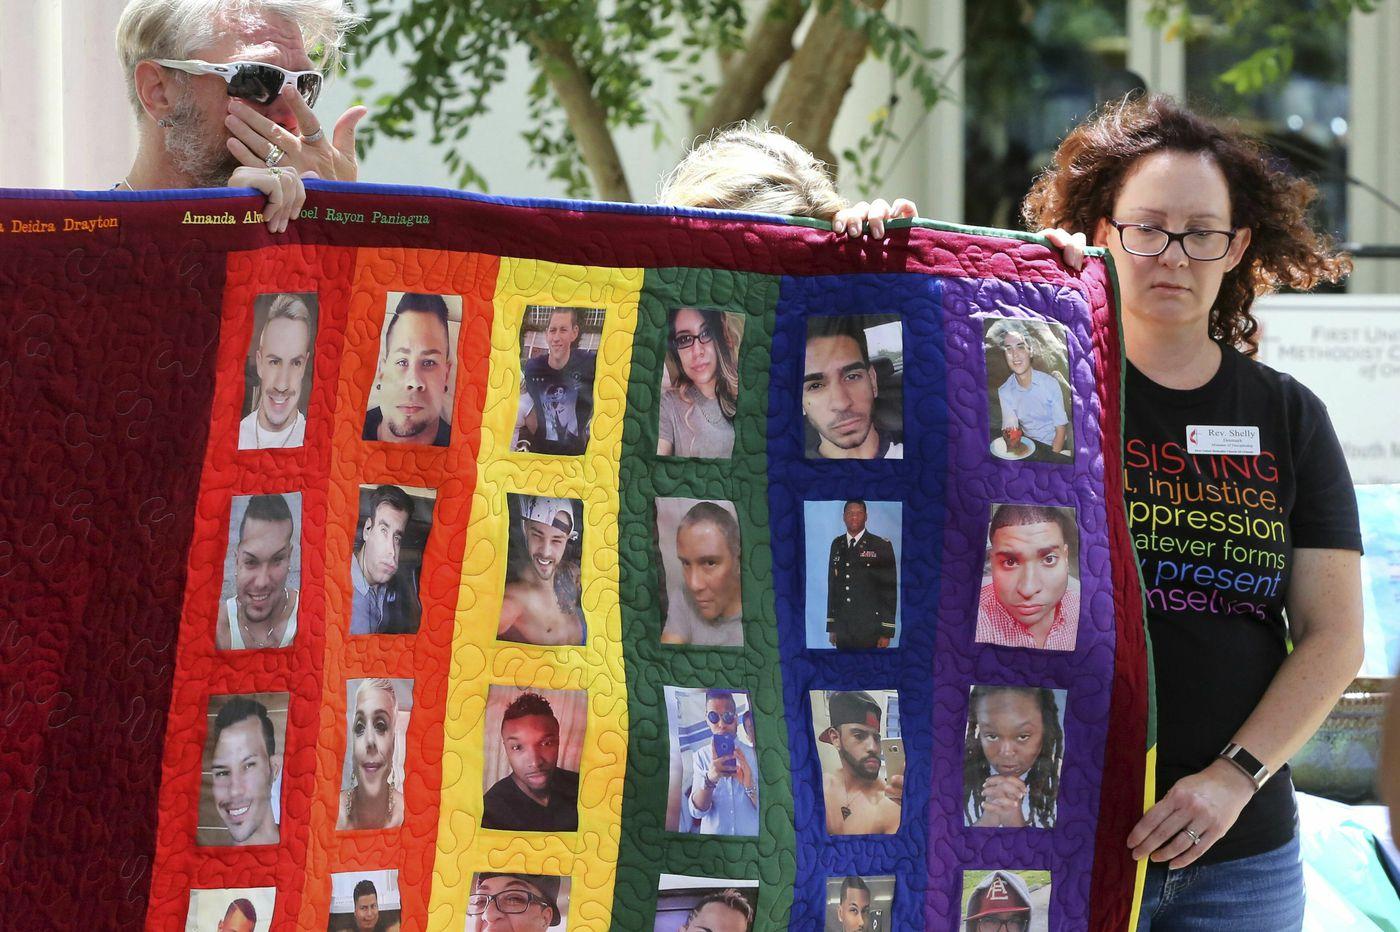 Somber memorials on anniversary of Florida nightclub rampage